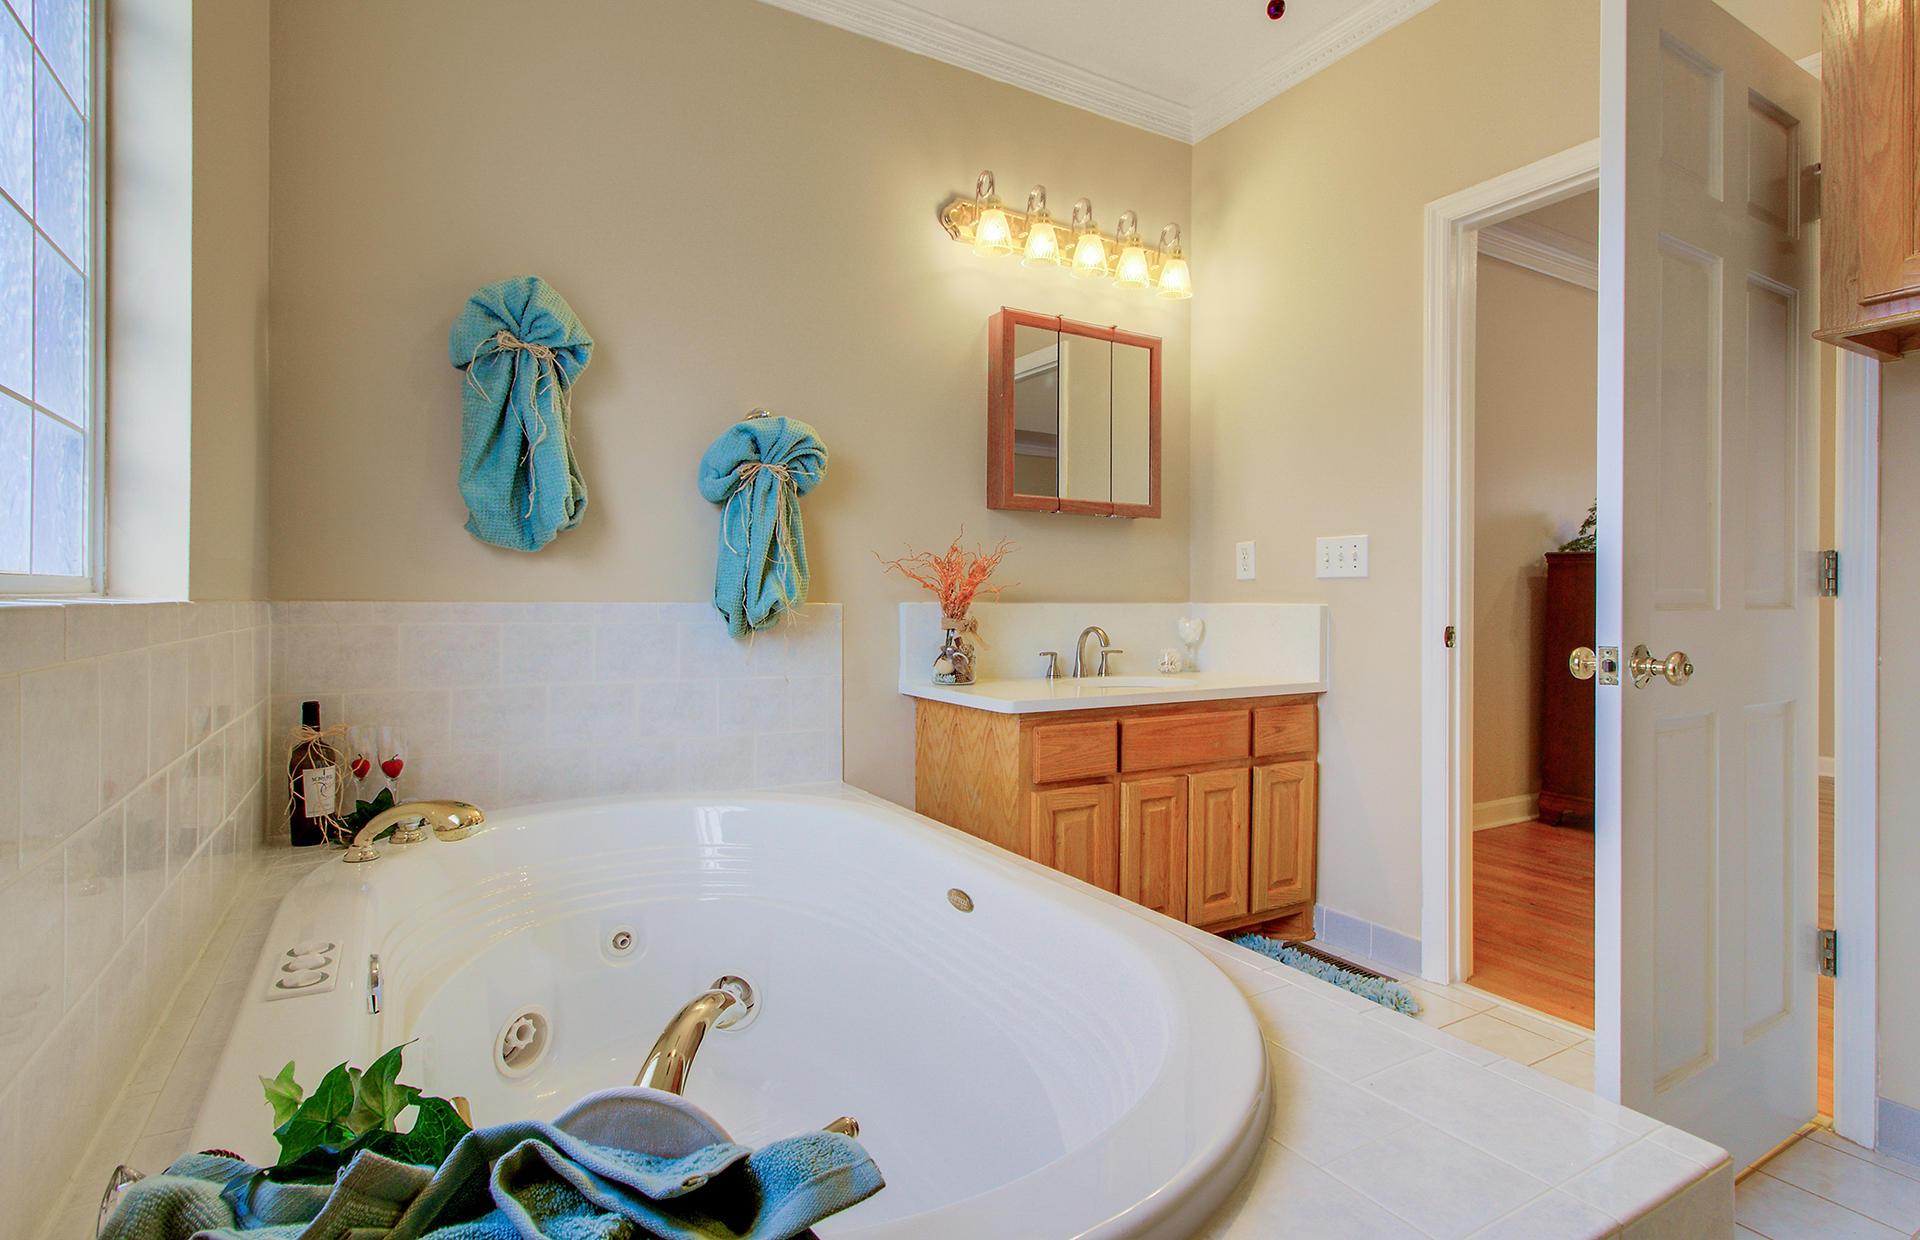 Bakers Landing Homes For Sale - 105 River Oak, North Charleston, SC - 12